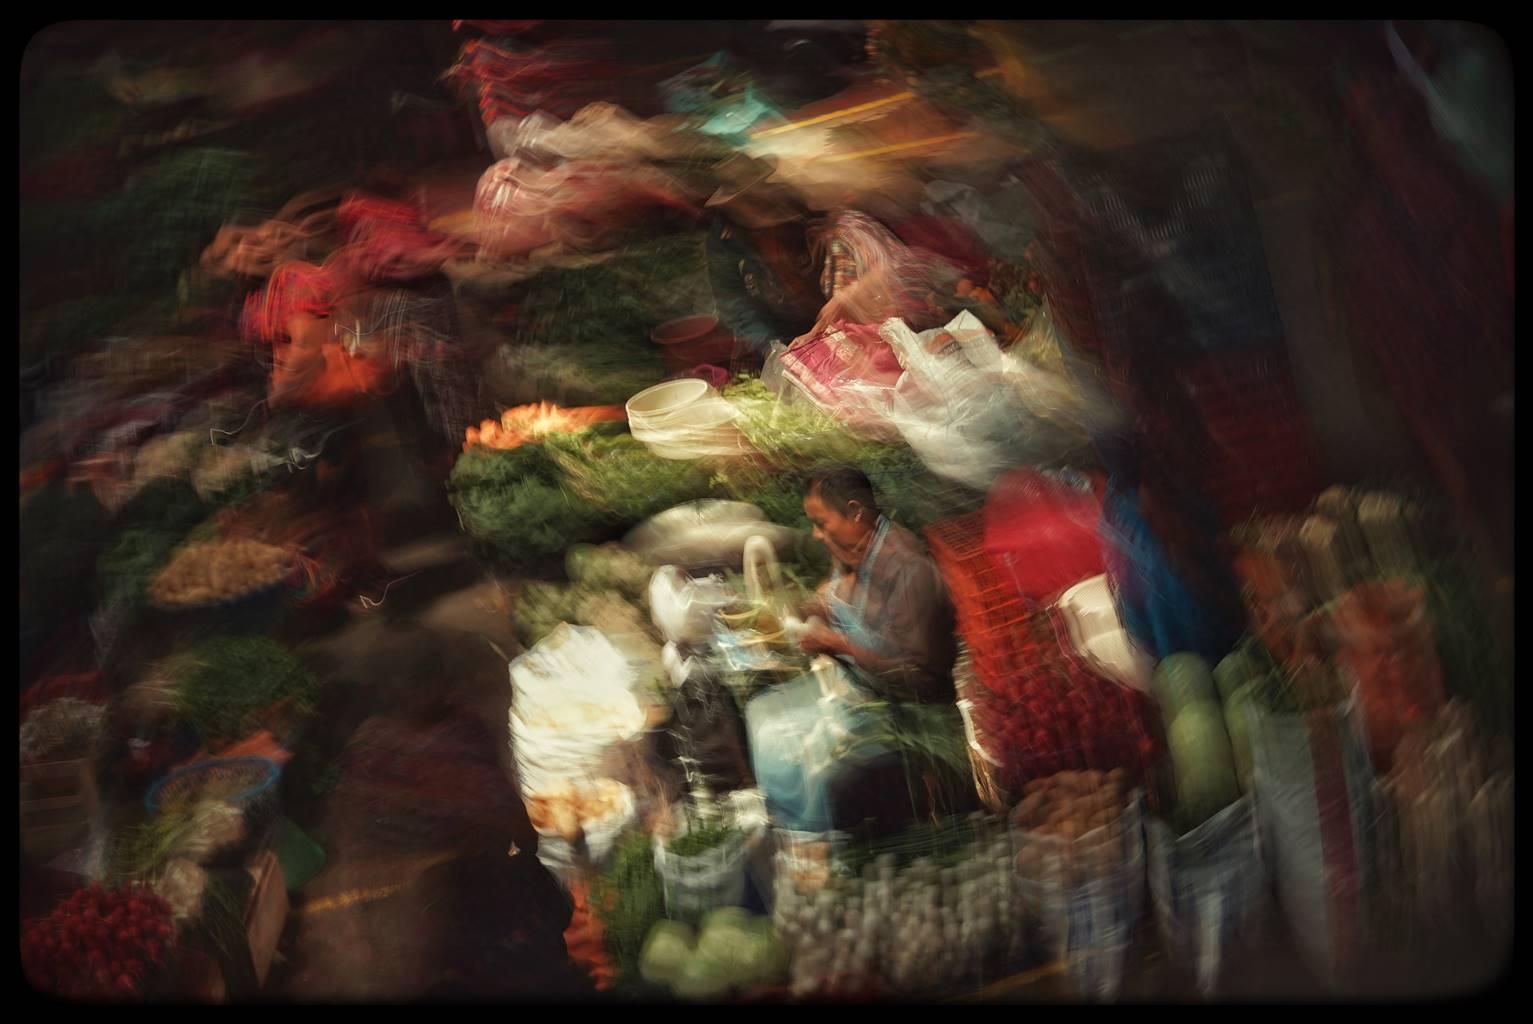 Danny Johananoff, The Greengrocer image